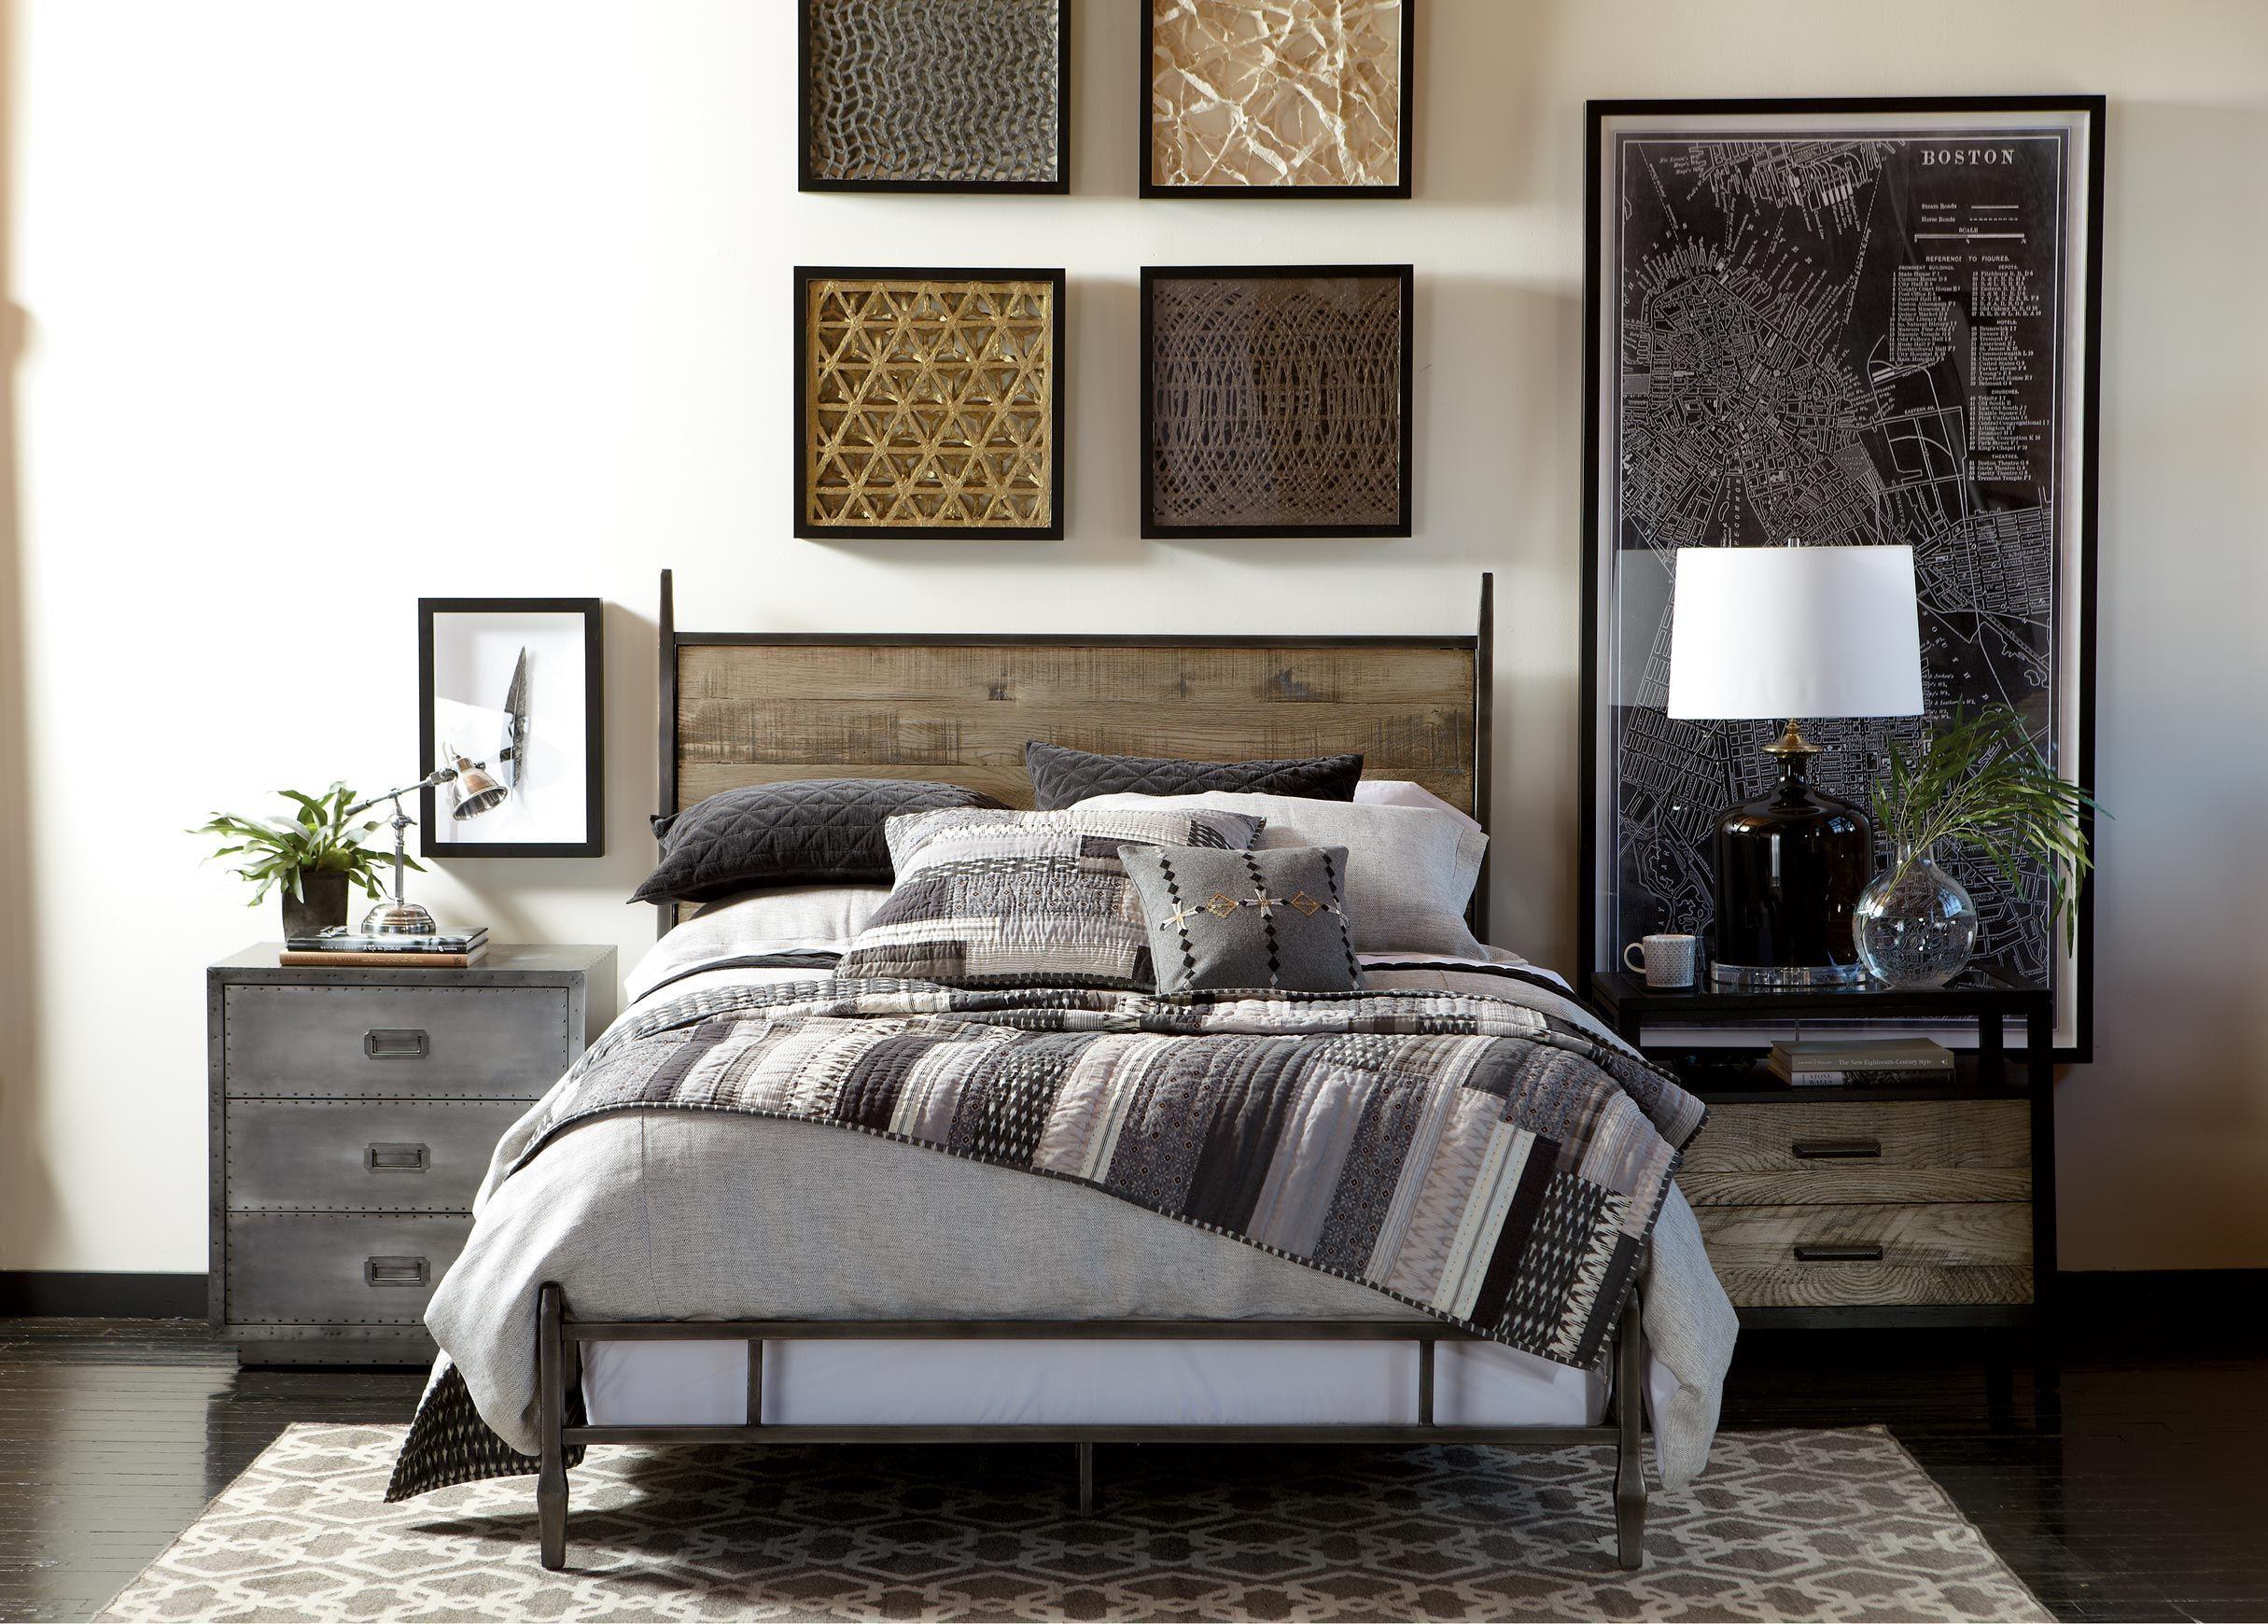 lincoln bed ethan allen us brooklyn pinterest bedrooms. Black Bedroom Furniture Sets. Home Design Ideas